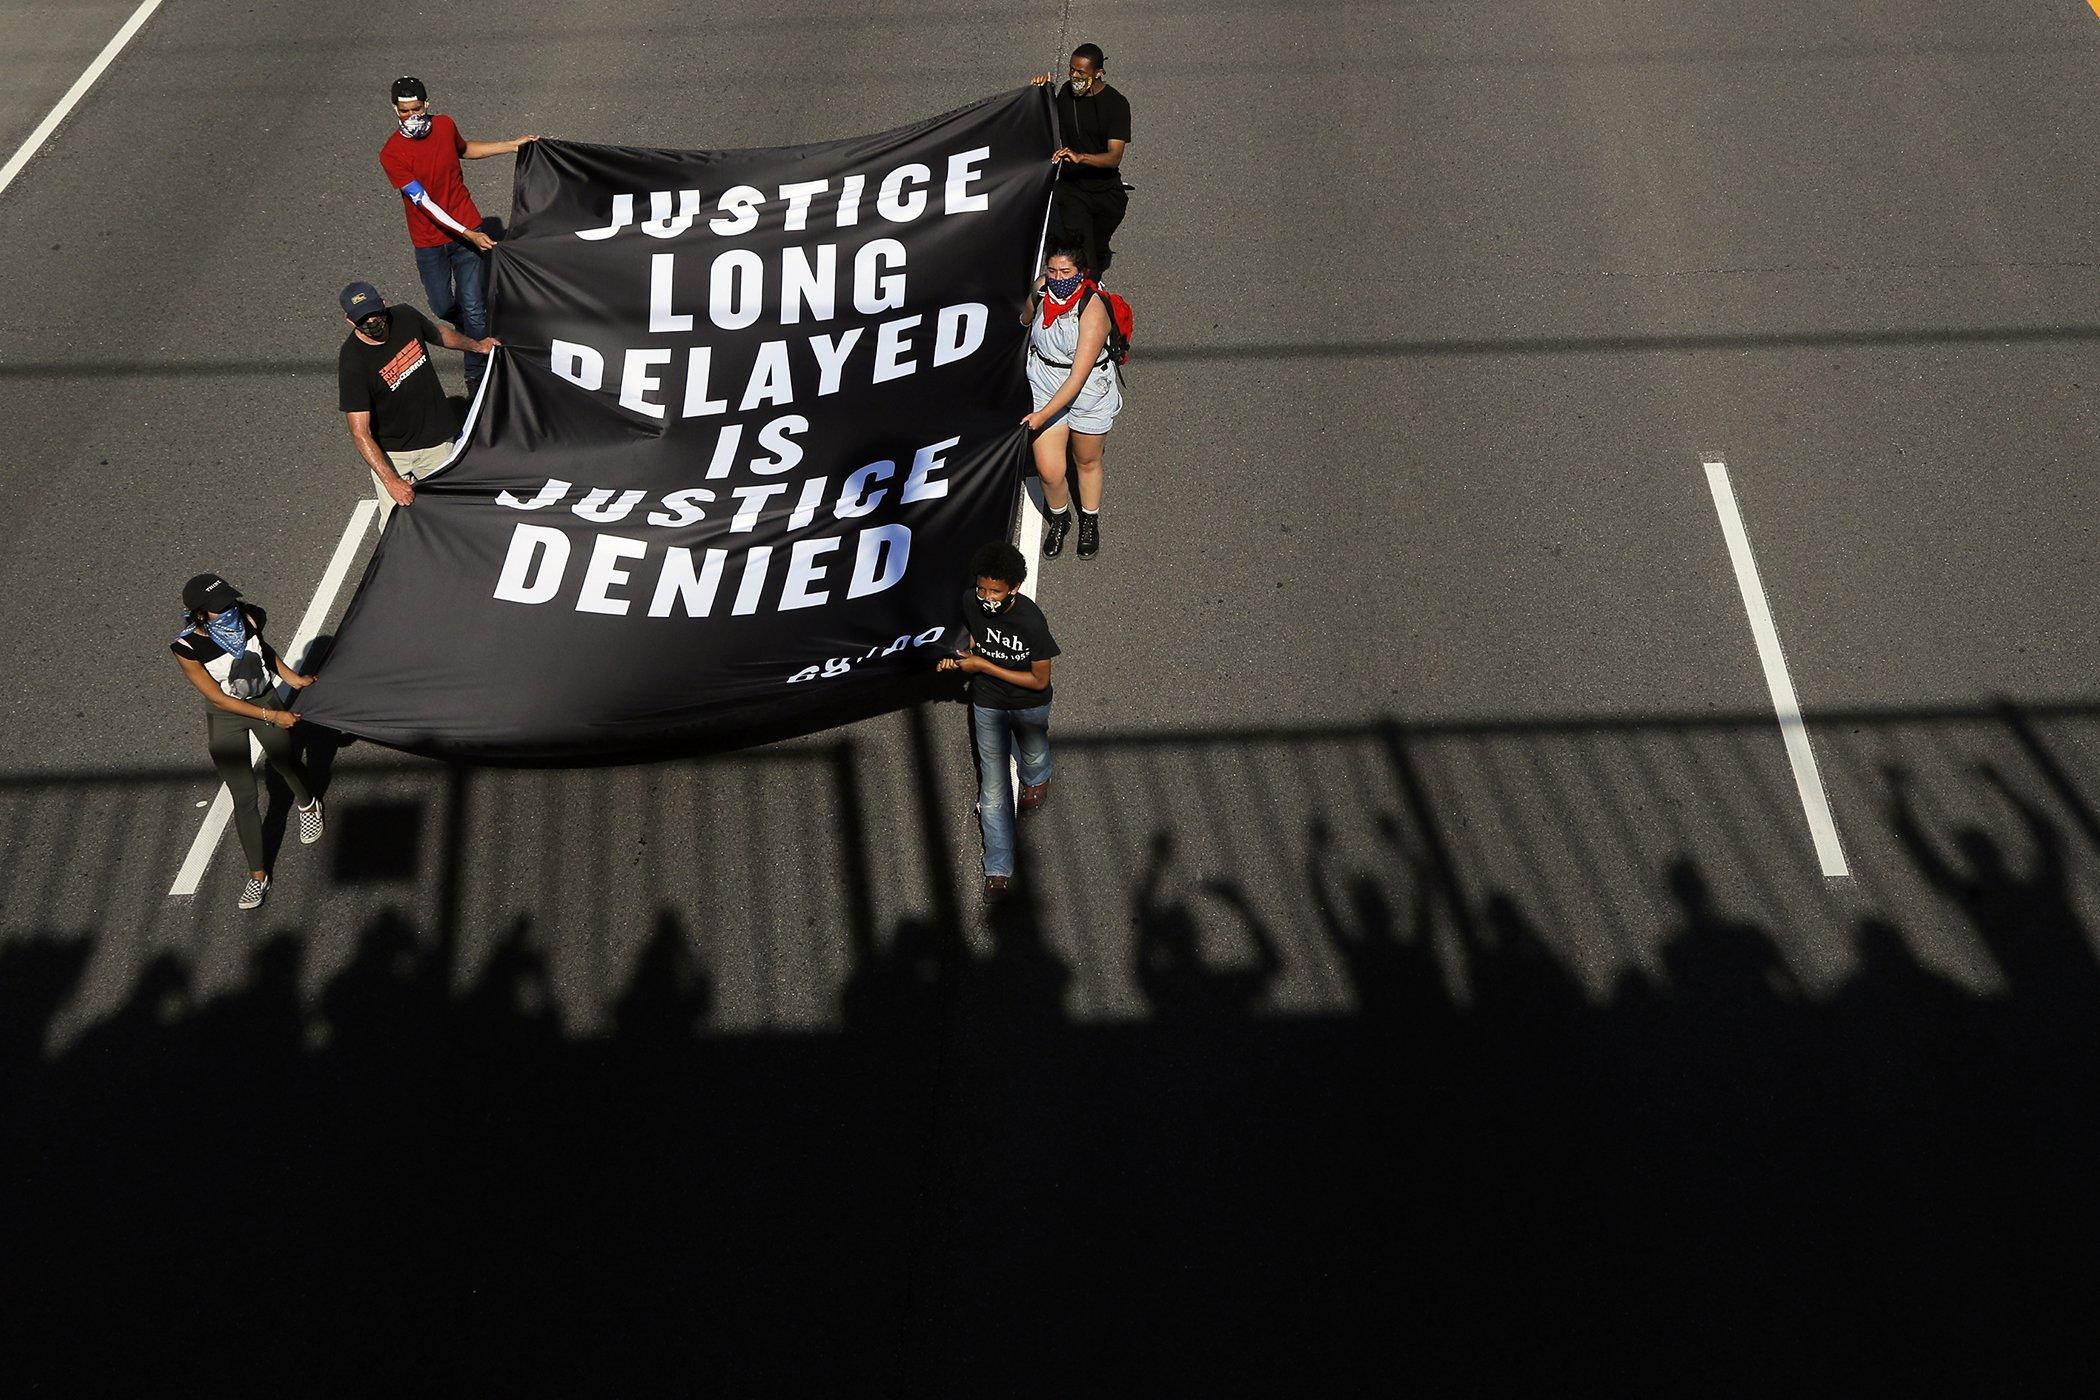 George-Floyd-Protests-Activism-Social-Justice.jpg